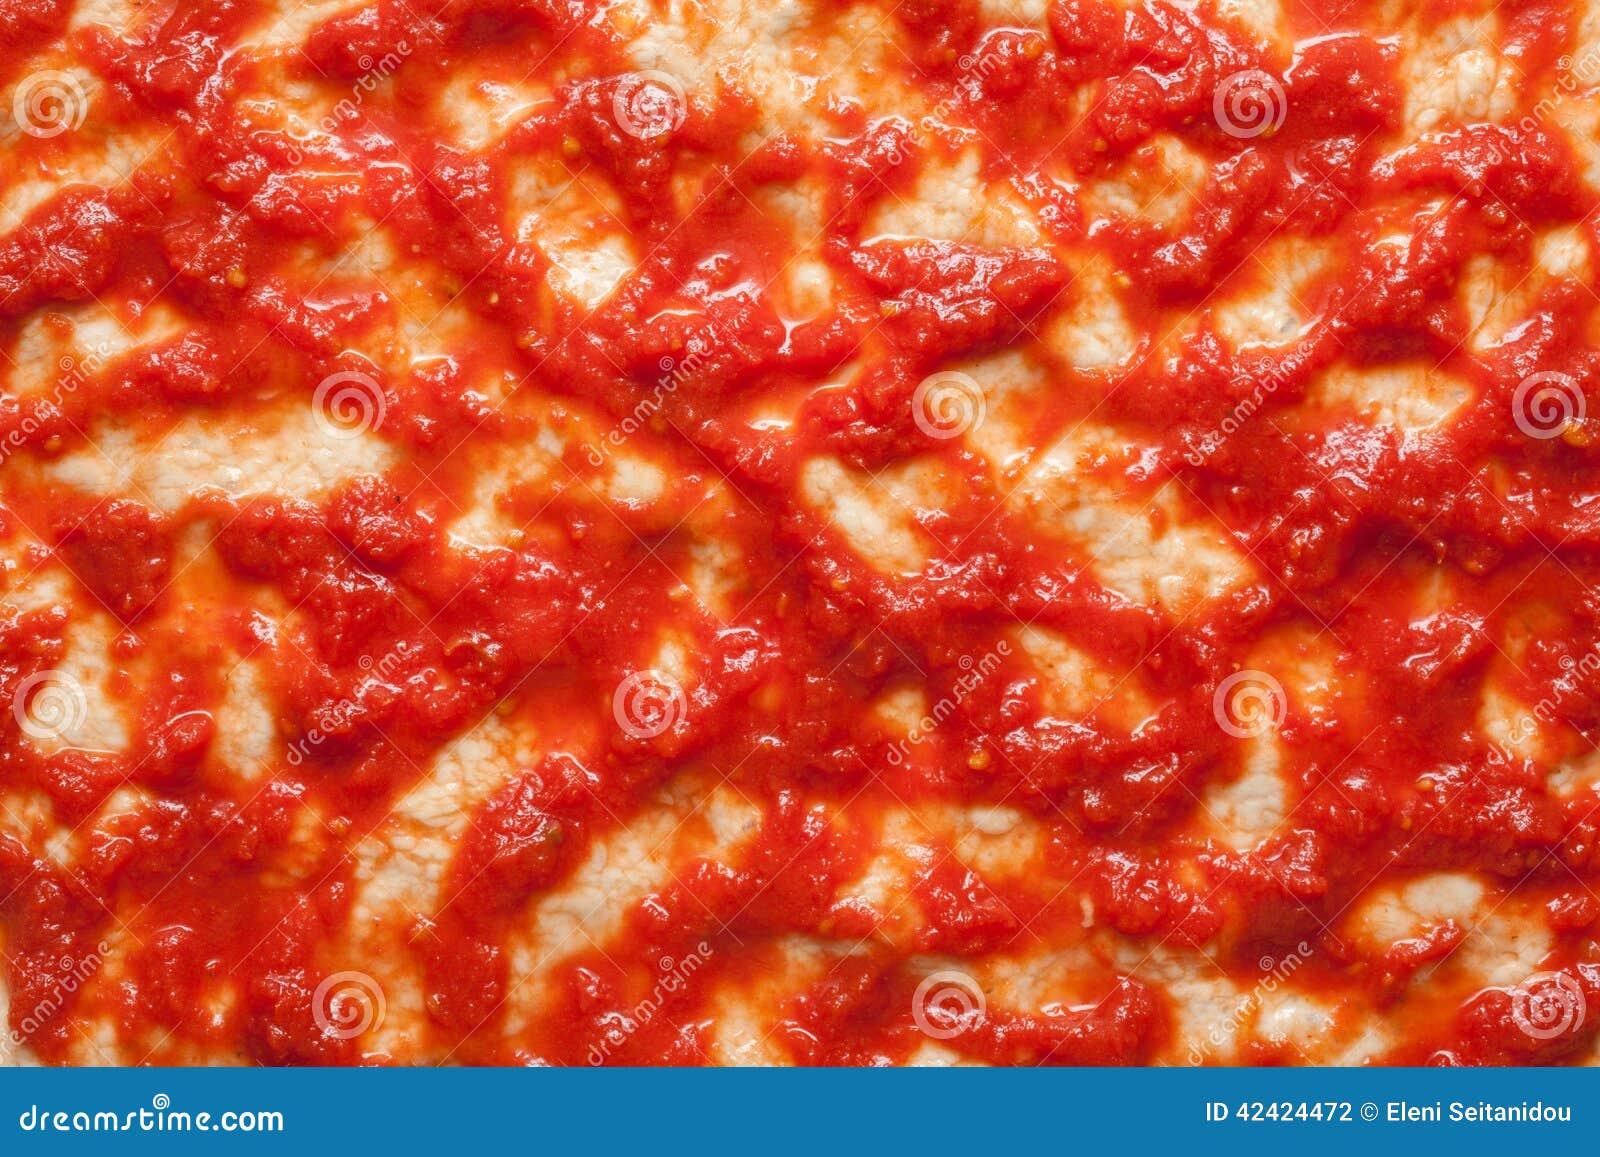 Raw Food Pizza Sauce Recipe